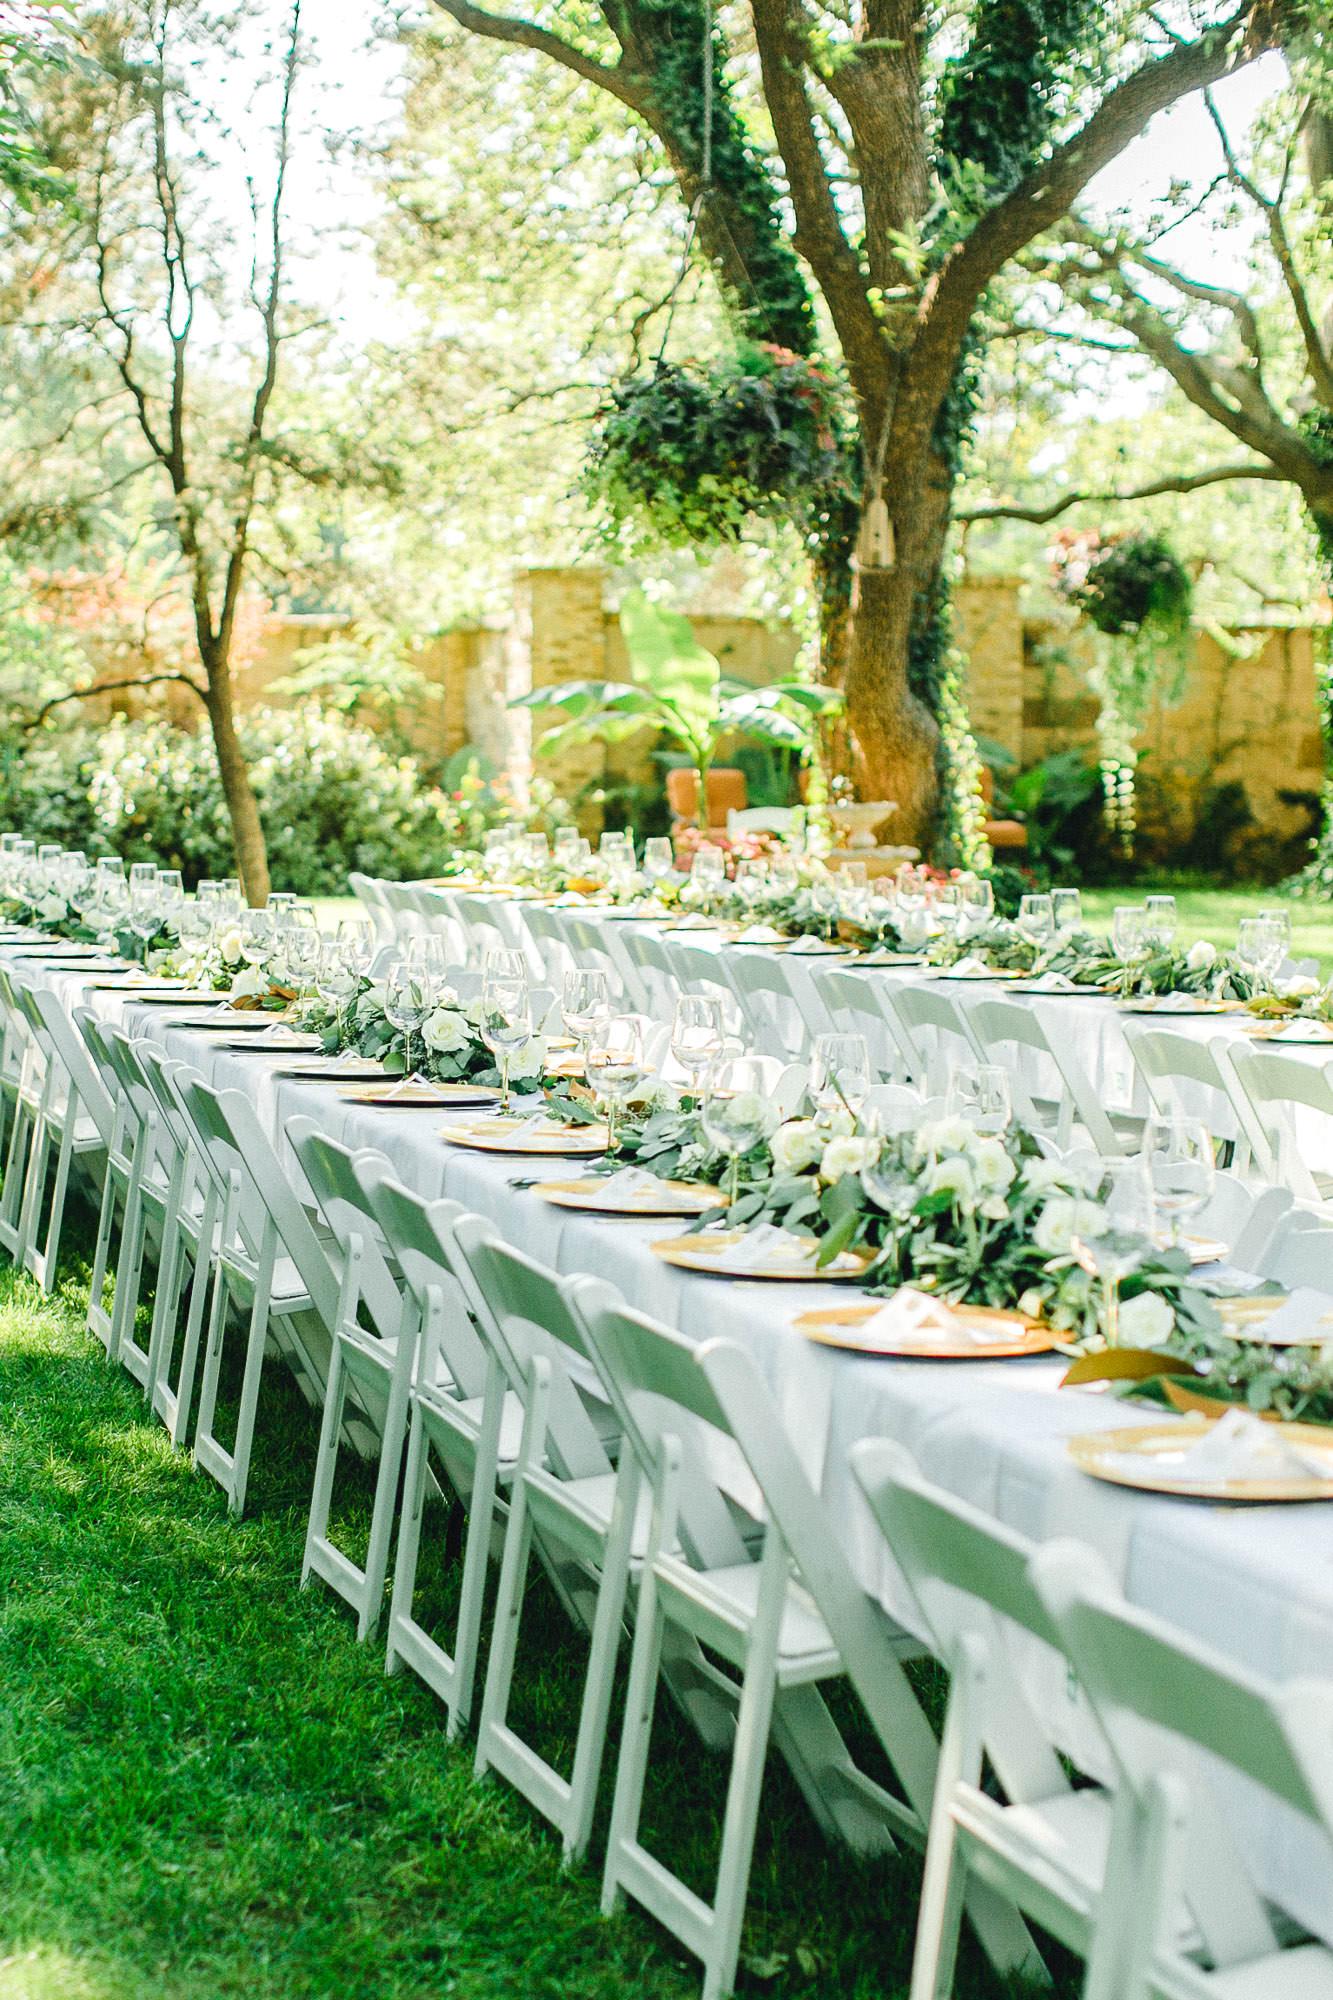 ali-brandon-hamilton-lubbock-wedding-photographer-estate-lee-lewis-construction-bee-alleej_0097.jpg